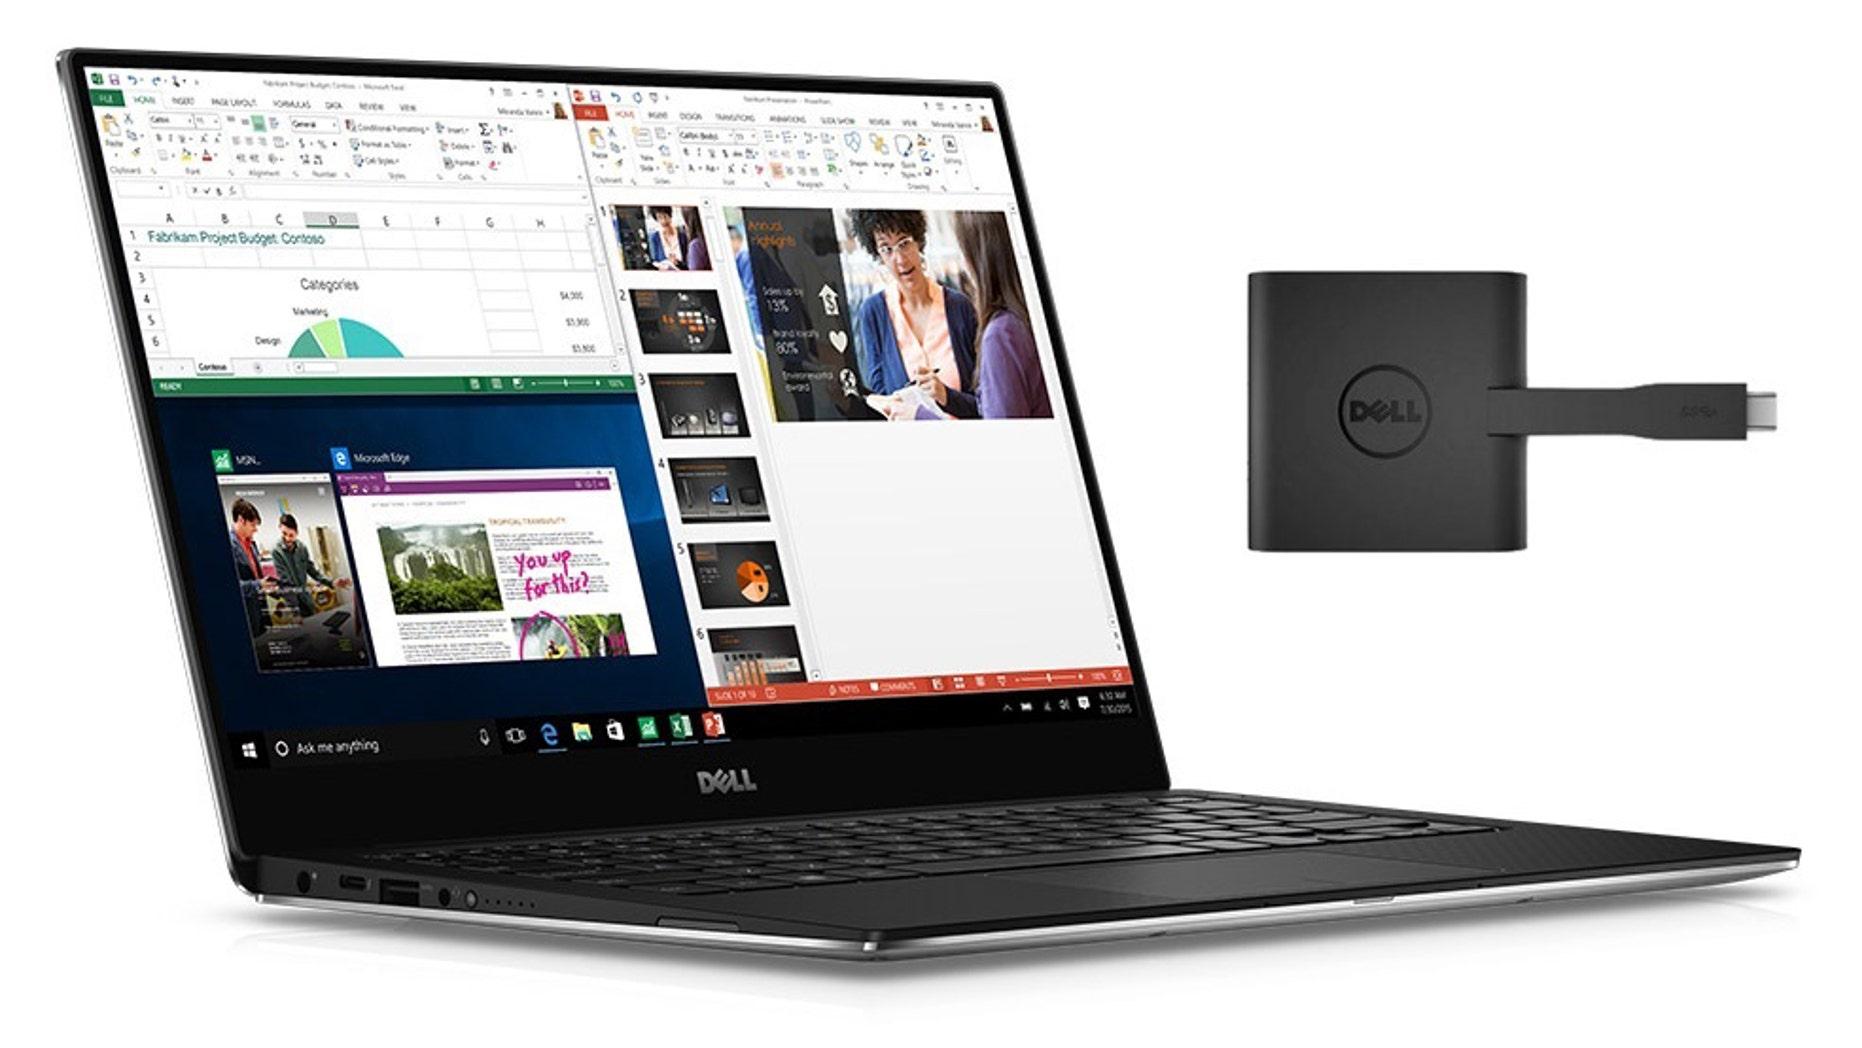 Dell XPS 13, 2016 version (Dell).